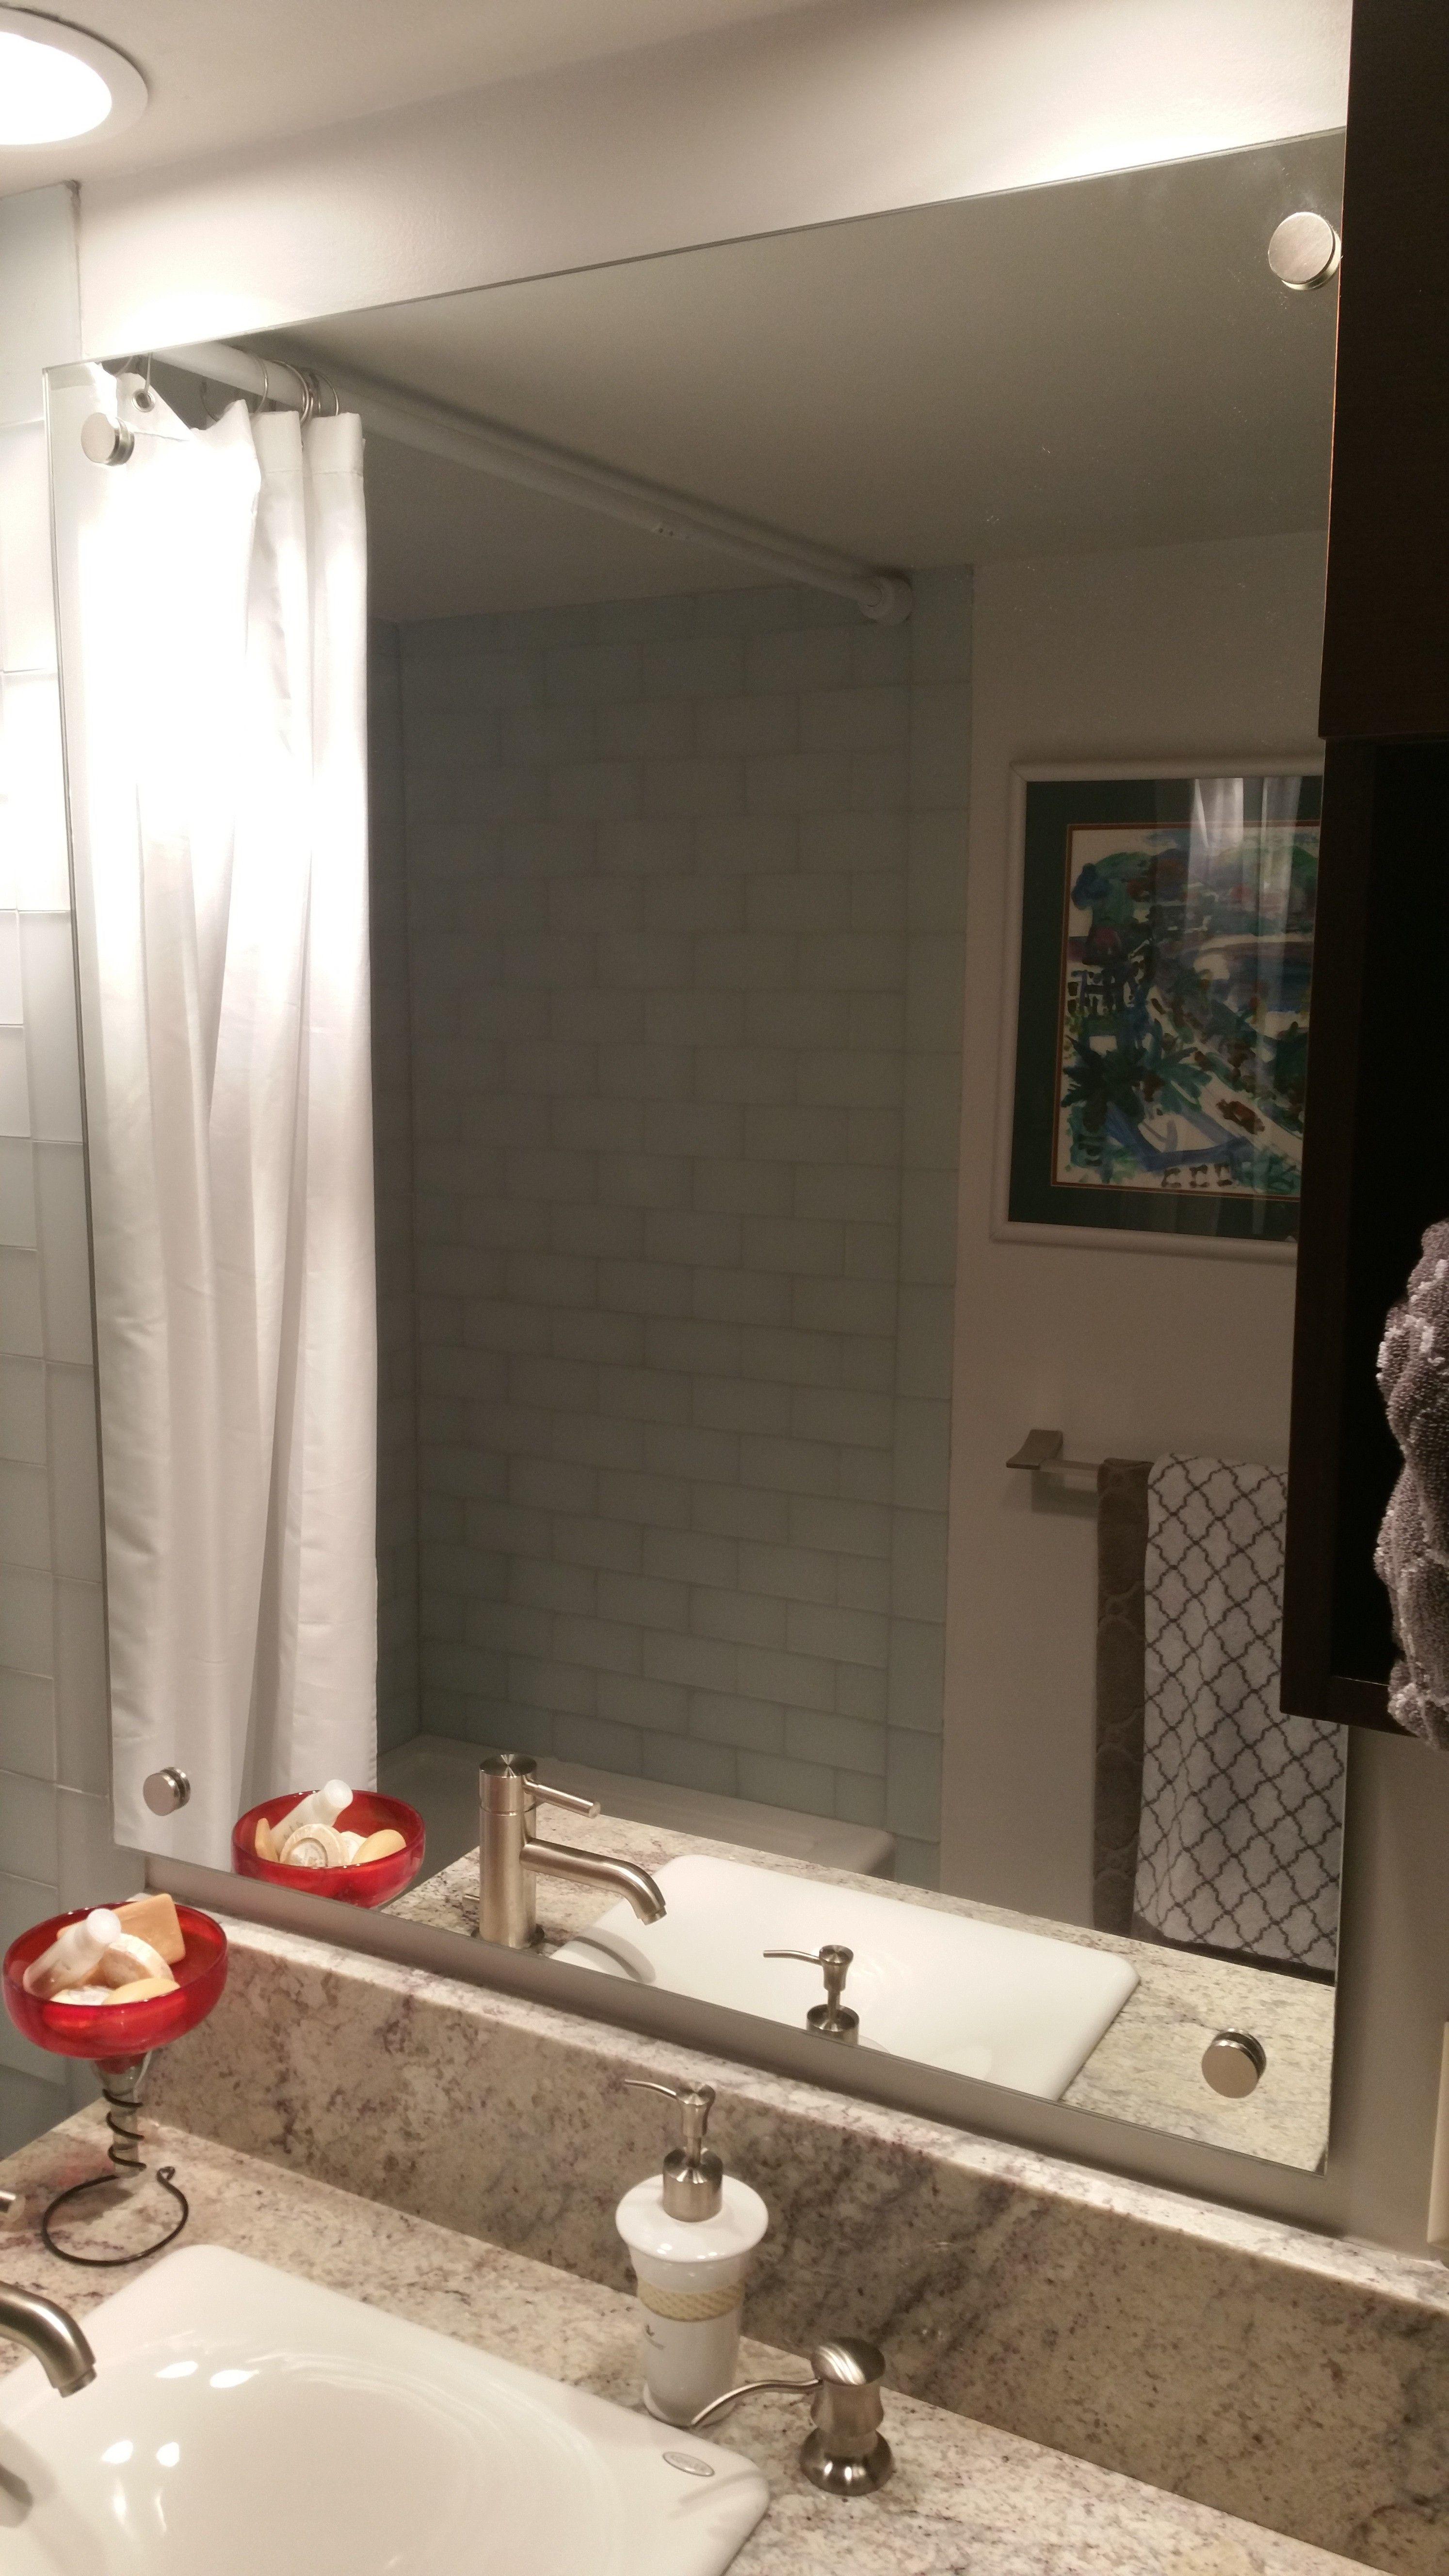 bathroom vanity mirror with standoffs residential glass binswanger glass kansas city independence missouri - Bathroom Cabinets Kansas City